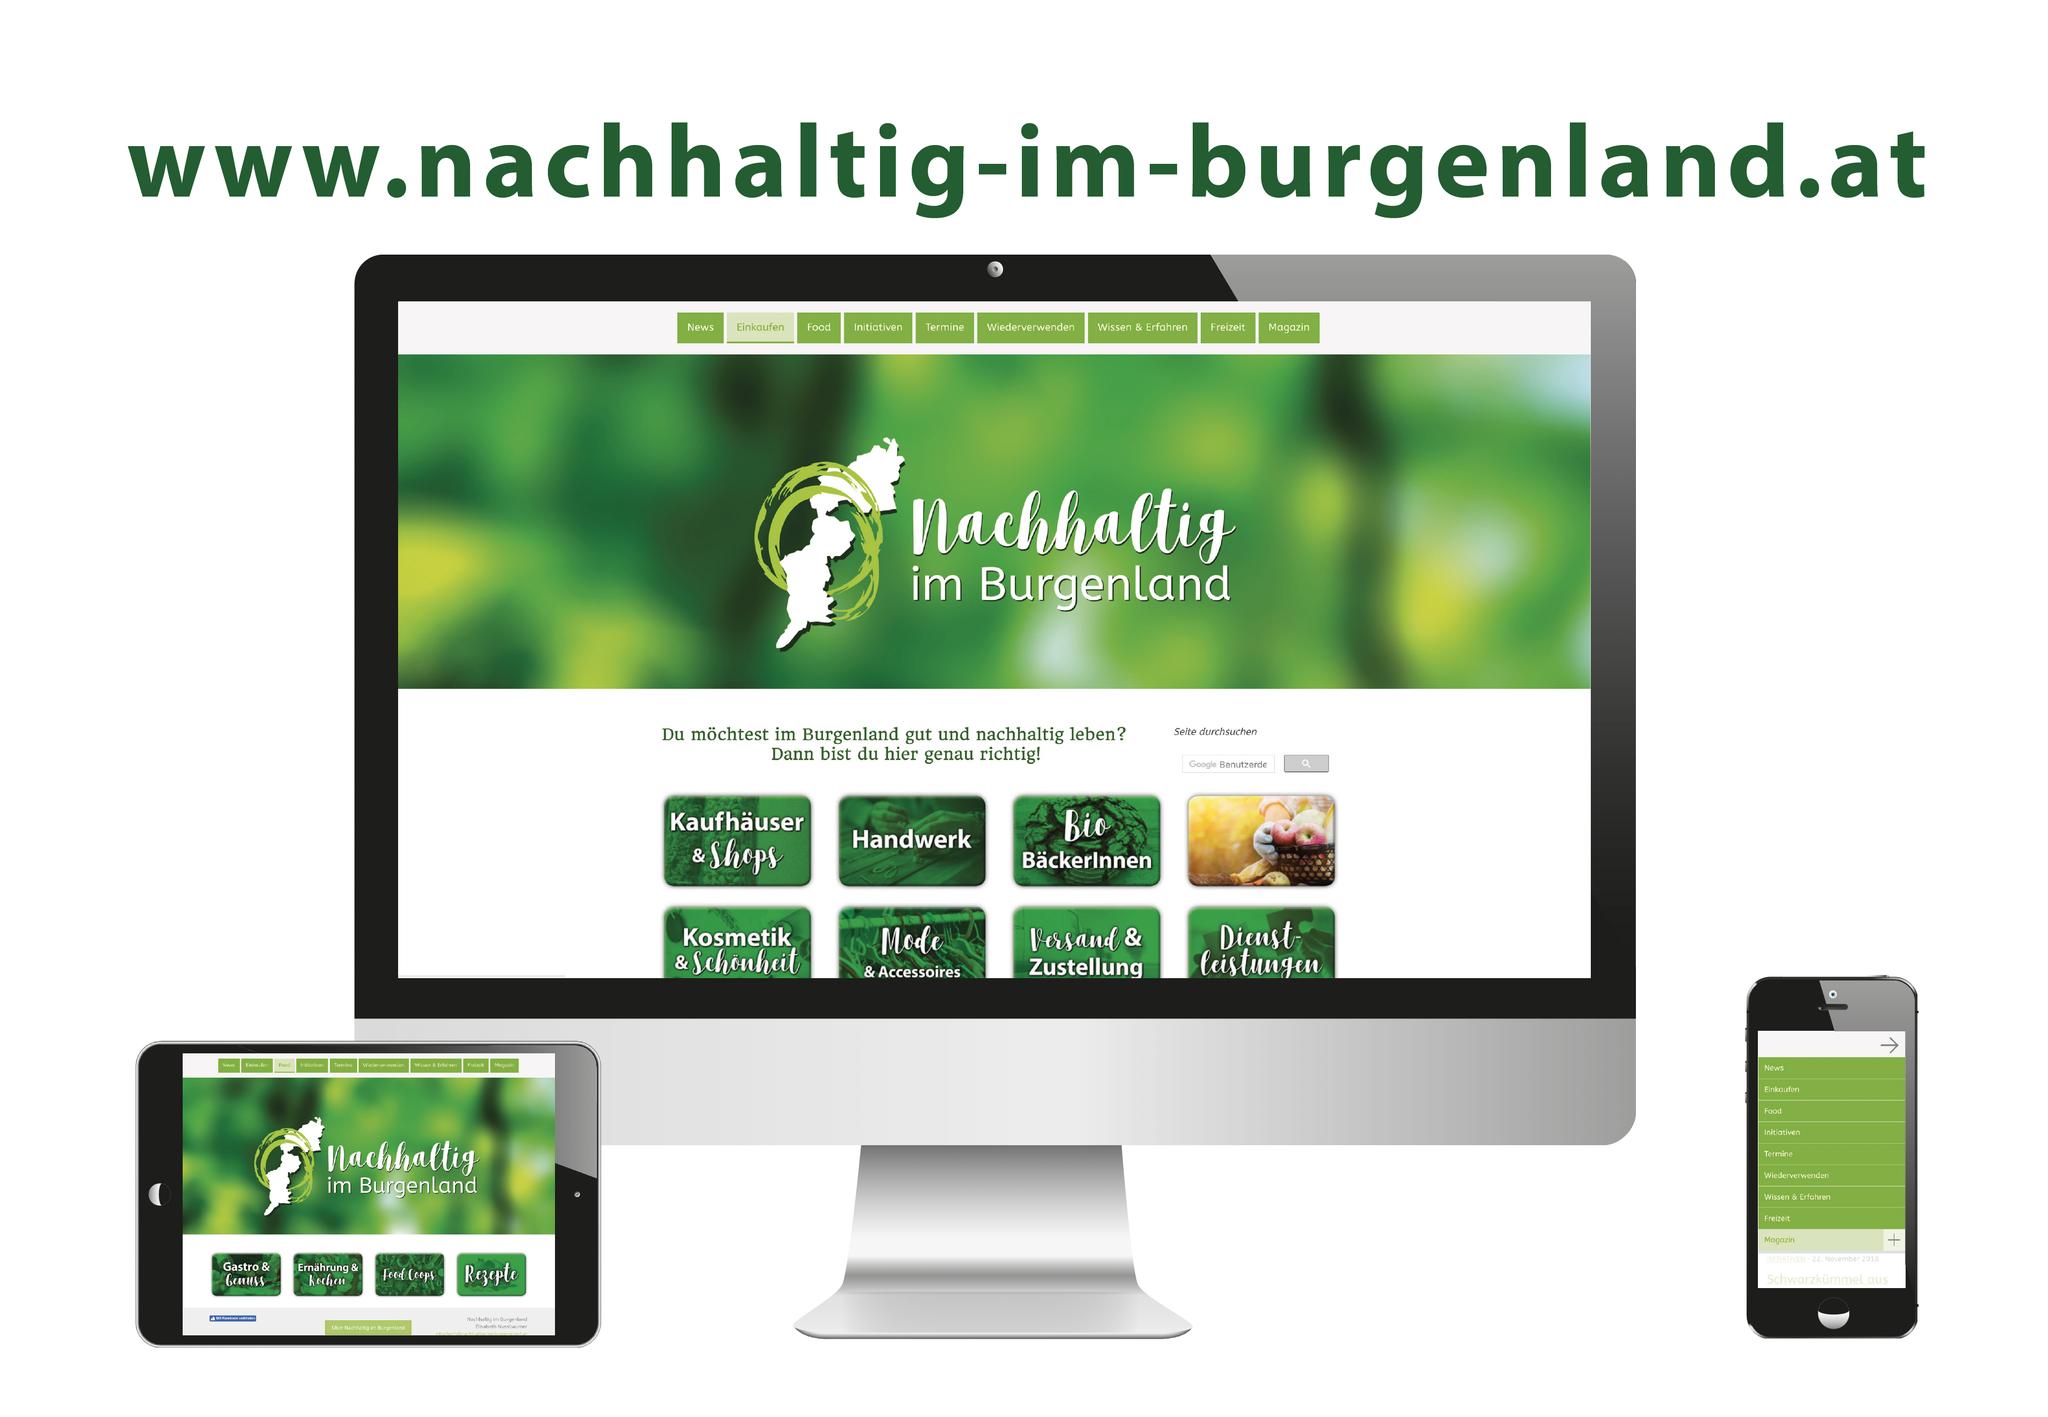 www.nachhaltig-im-burgenland.at